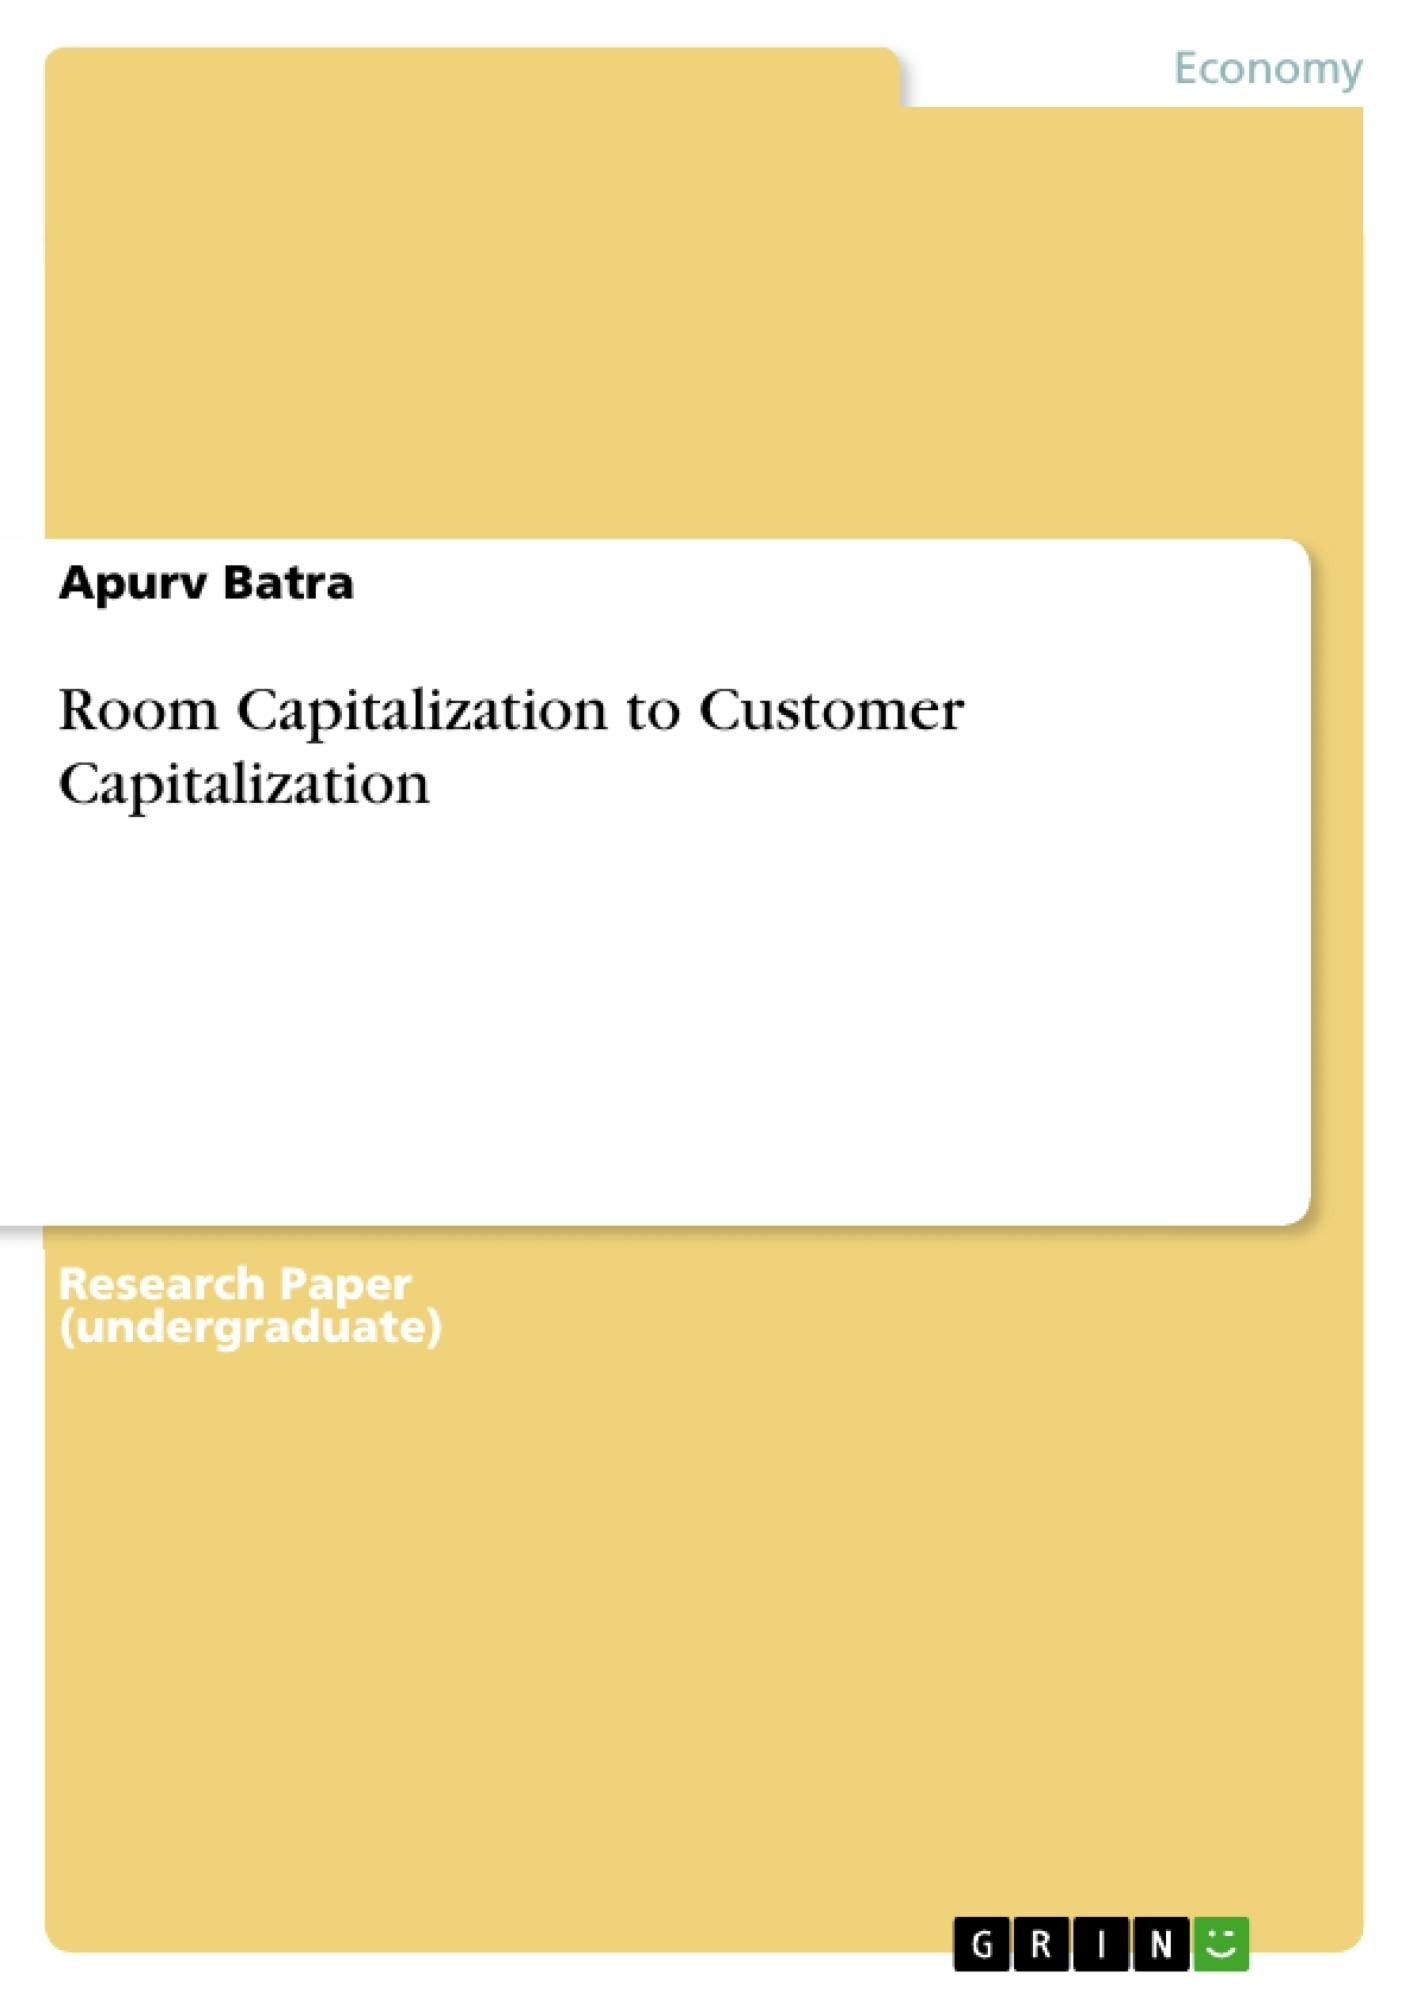 Title: Room Capitalization to Customer Capitalization